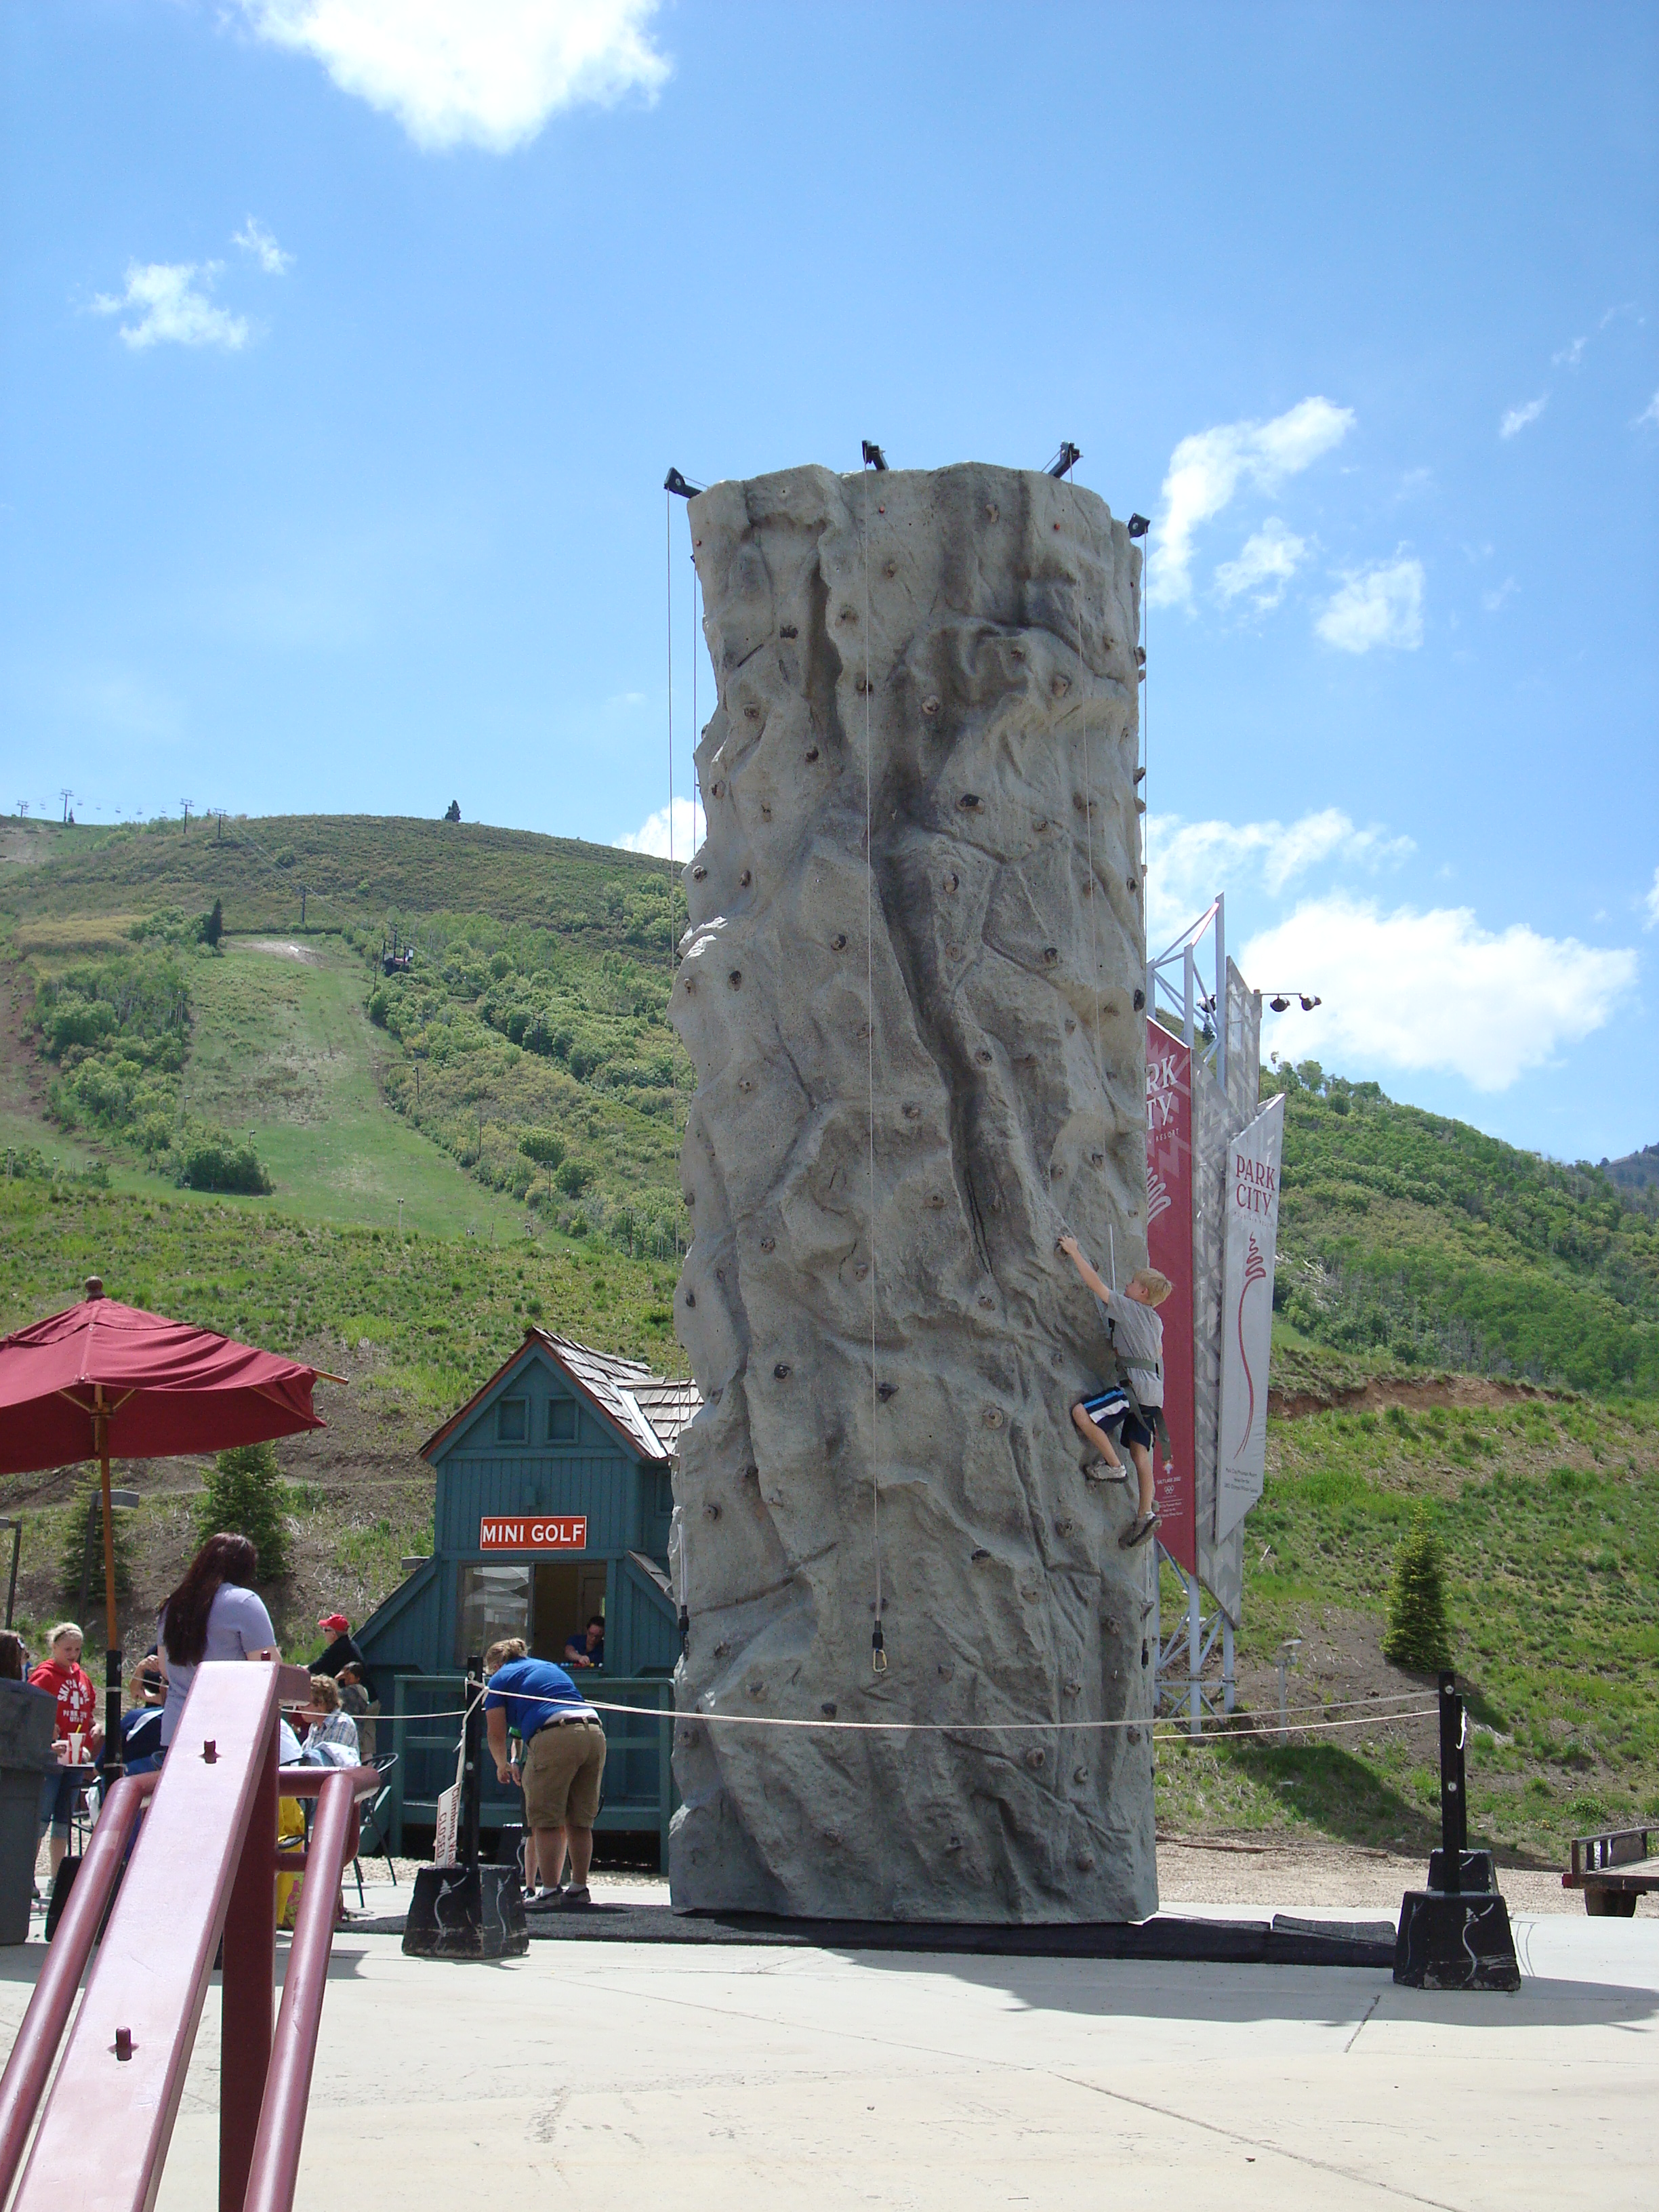 climbing wall @ park city mountain resort - park city, utah image